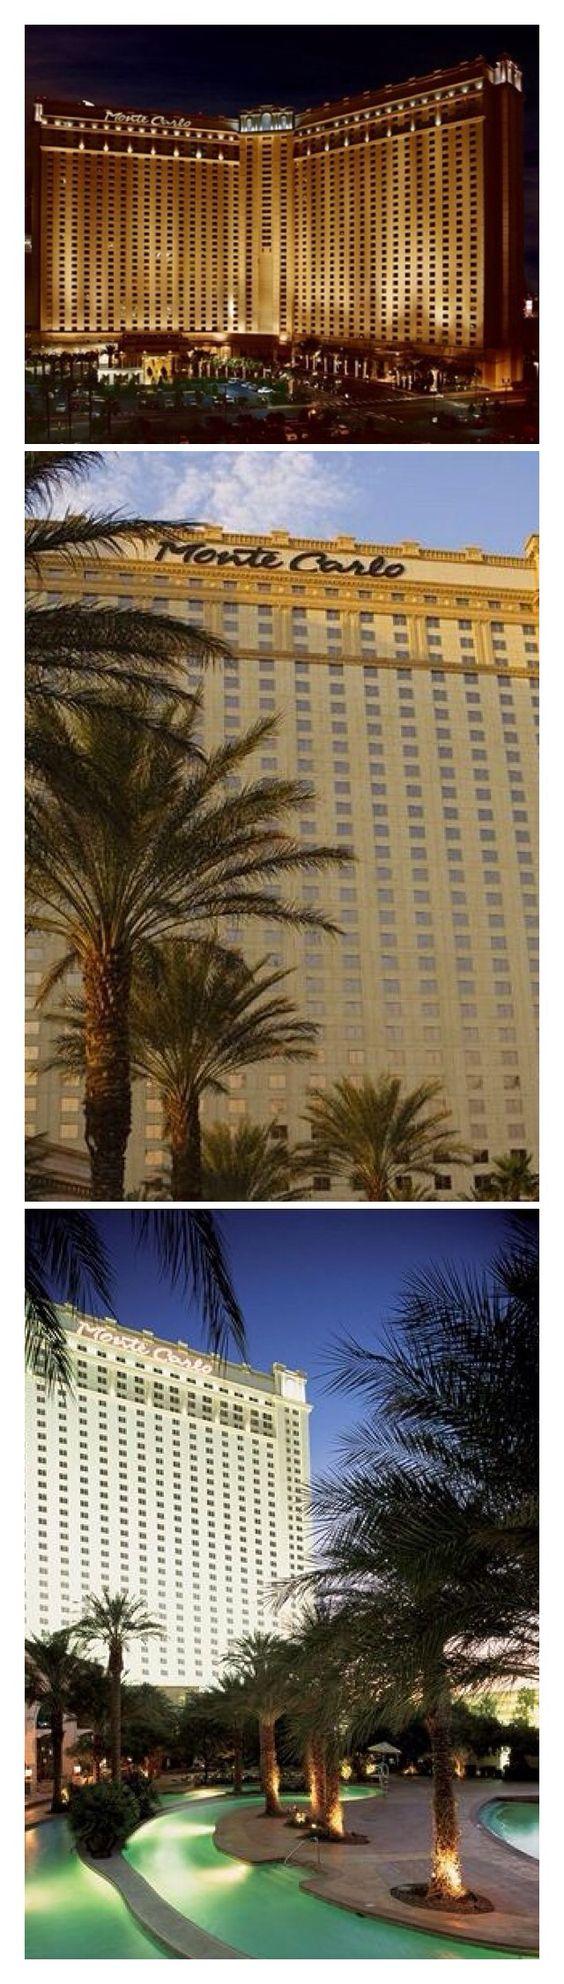 The Monte Carlo - Las Vegas